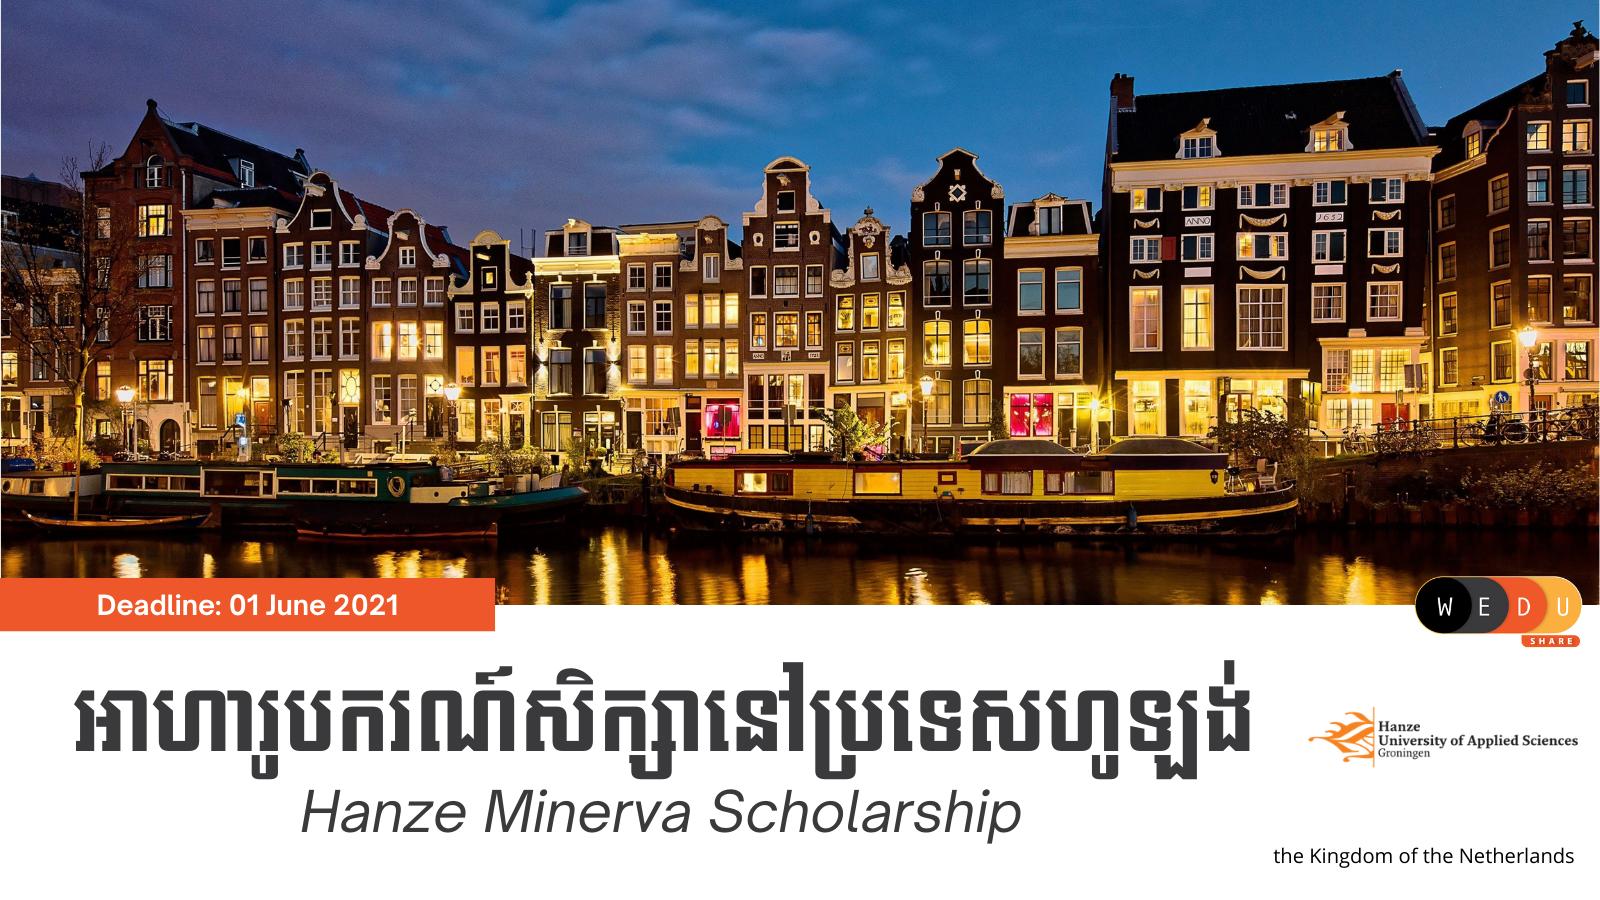 Hanze Minerva Scholarship